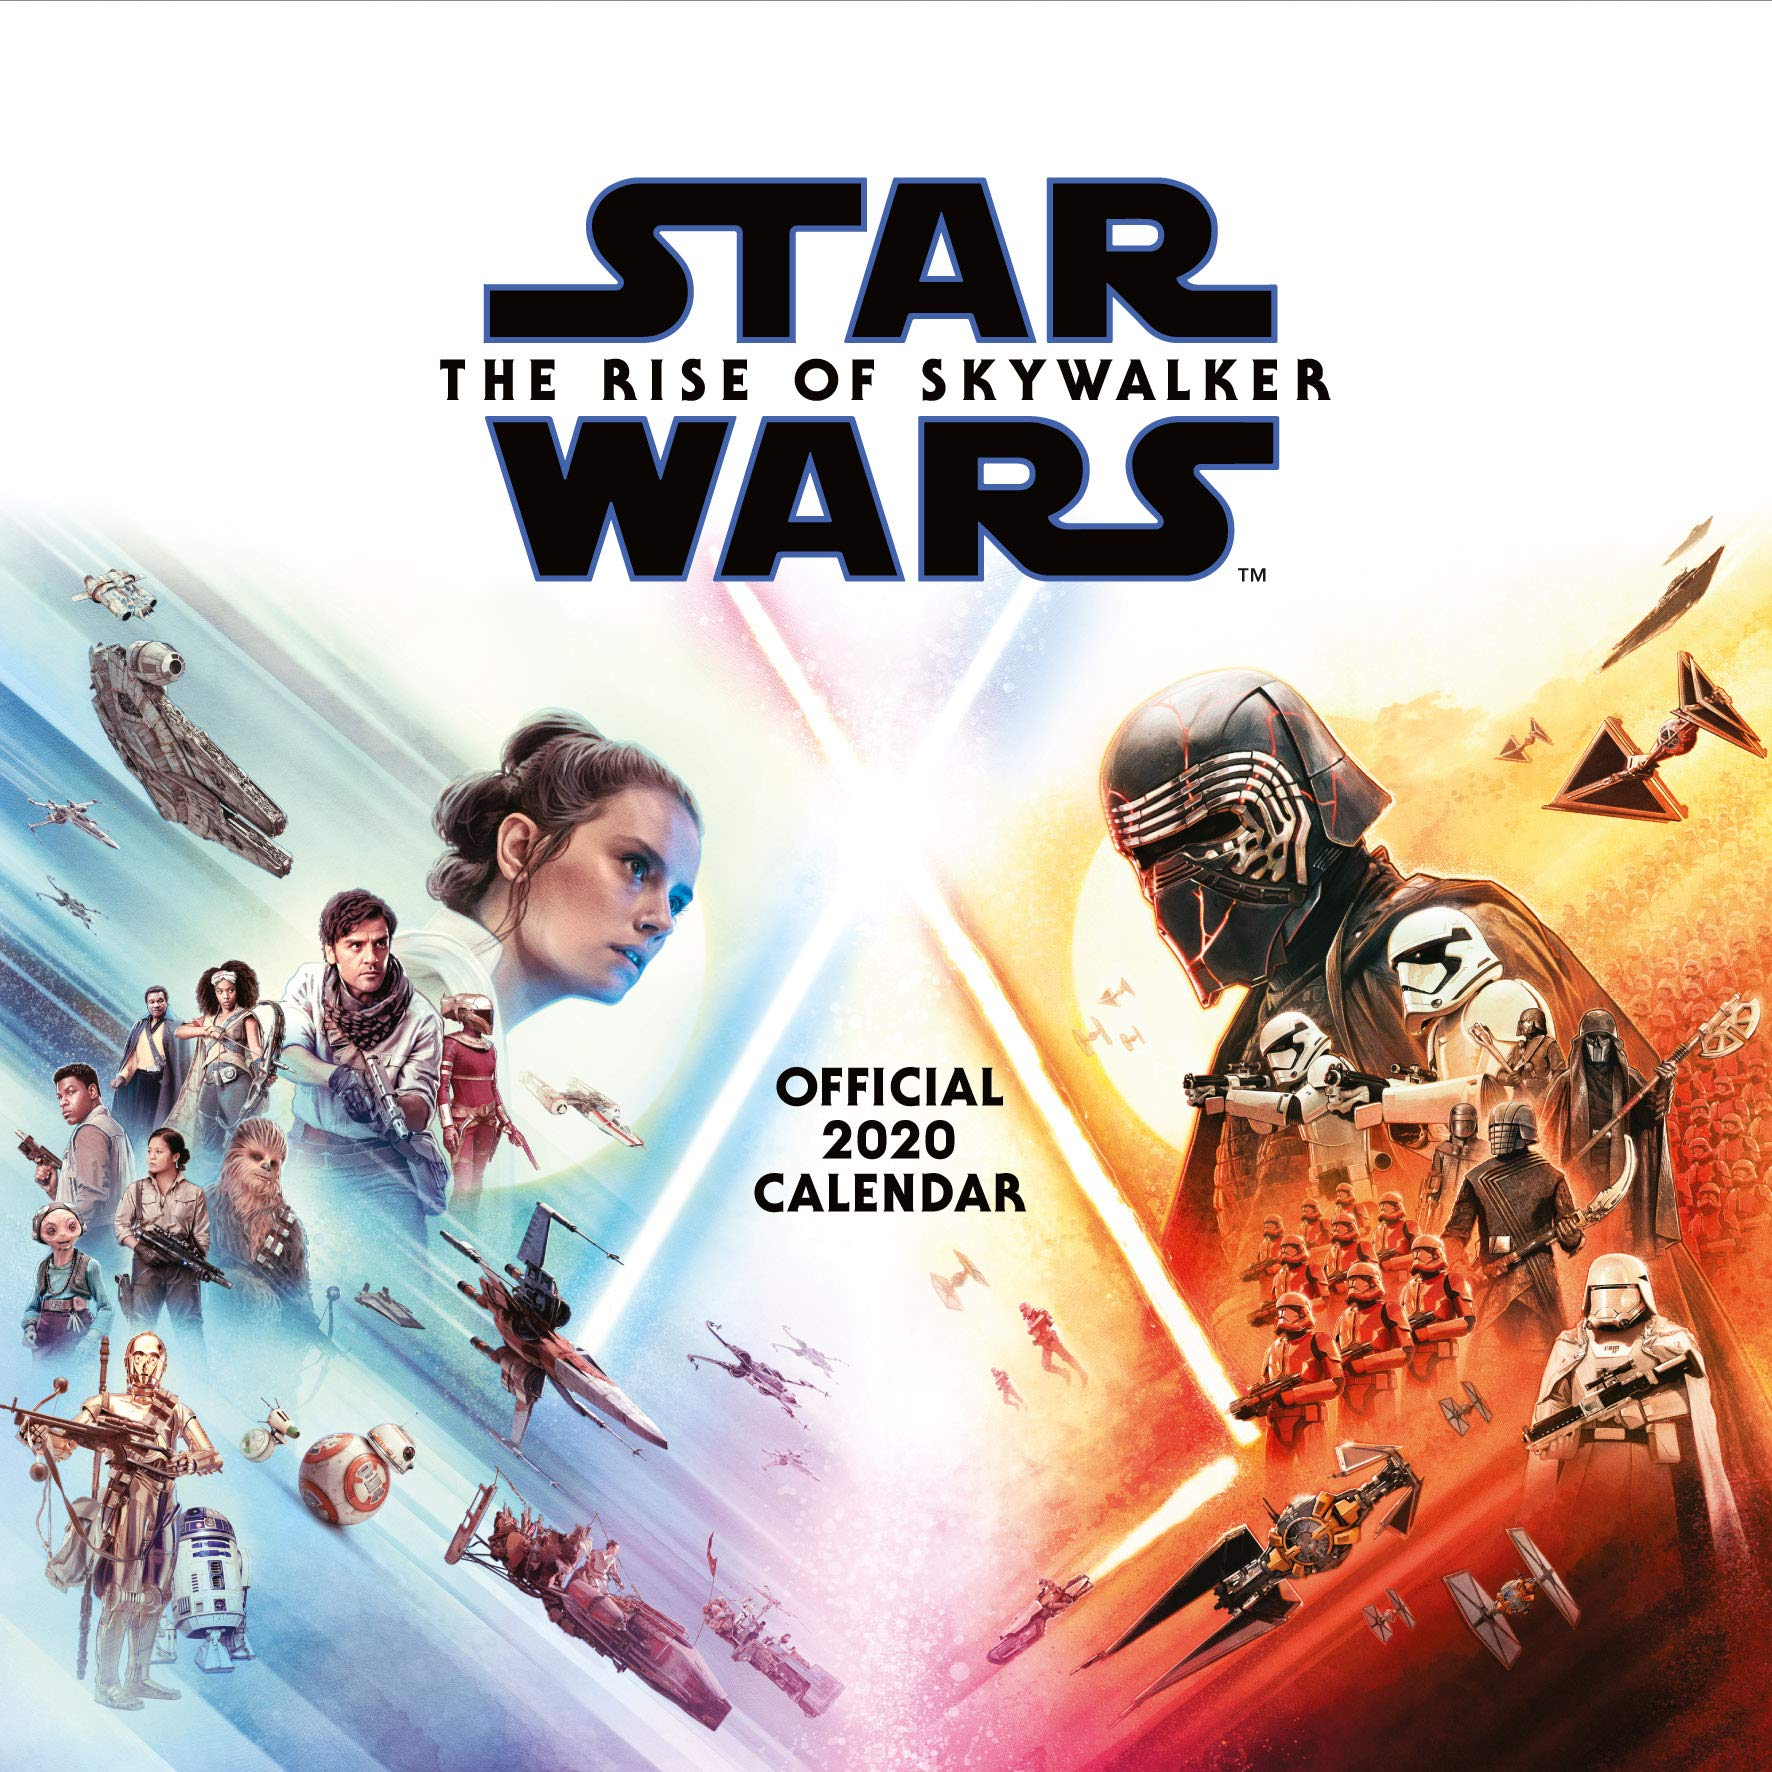 Star Wars Episode 9 2020 Calendar Official Square Wall Format Calendar 9781838540906 Amazon Com Books